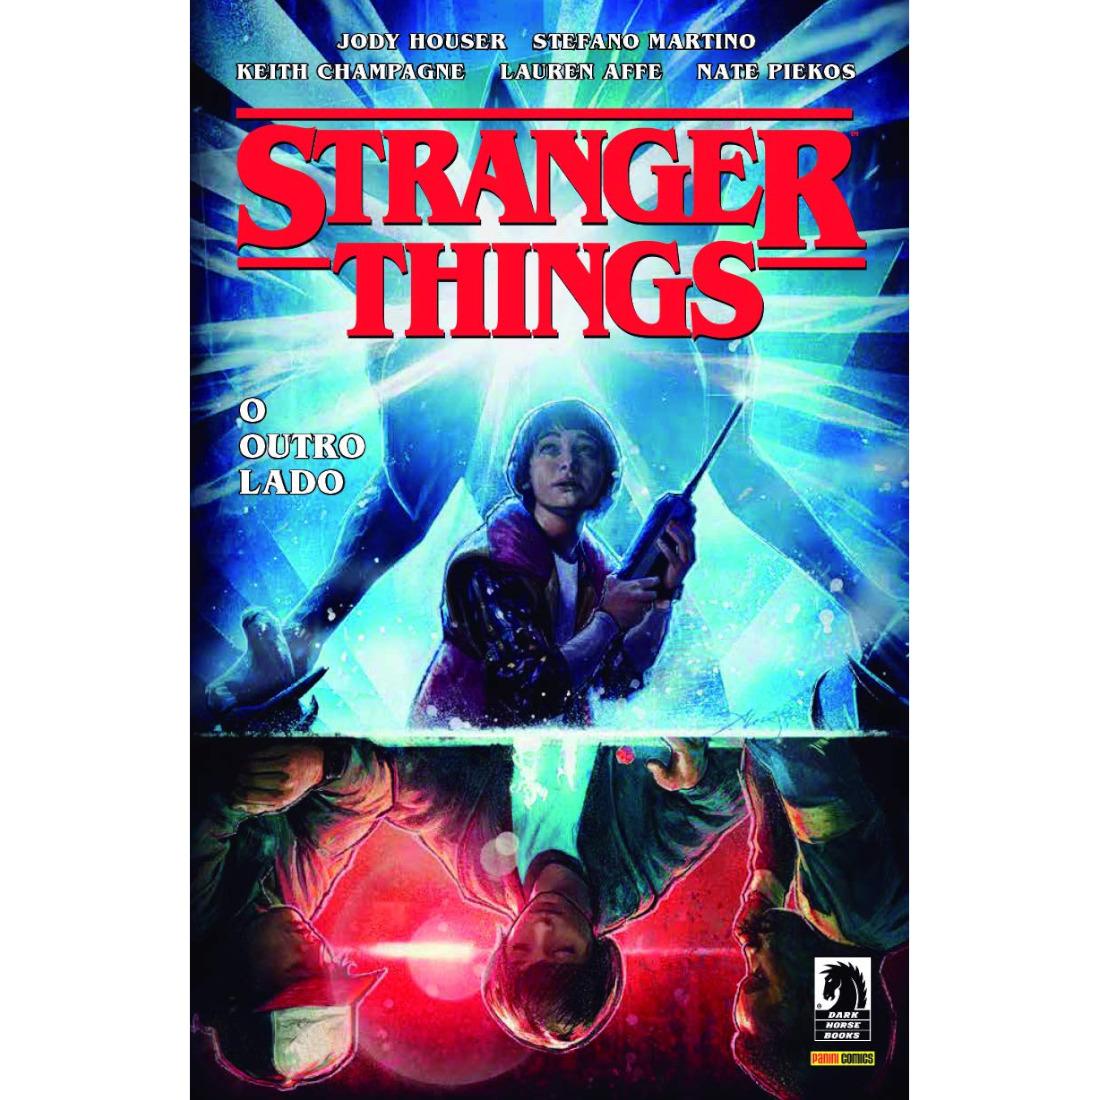 Stranger Things Vol. 1 - O Outro Lado